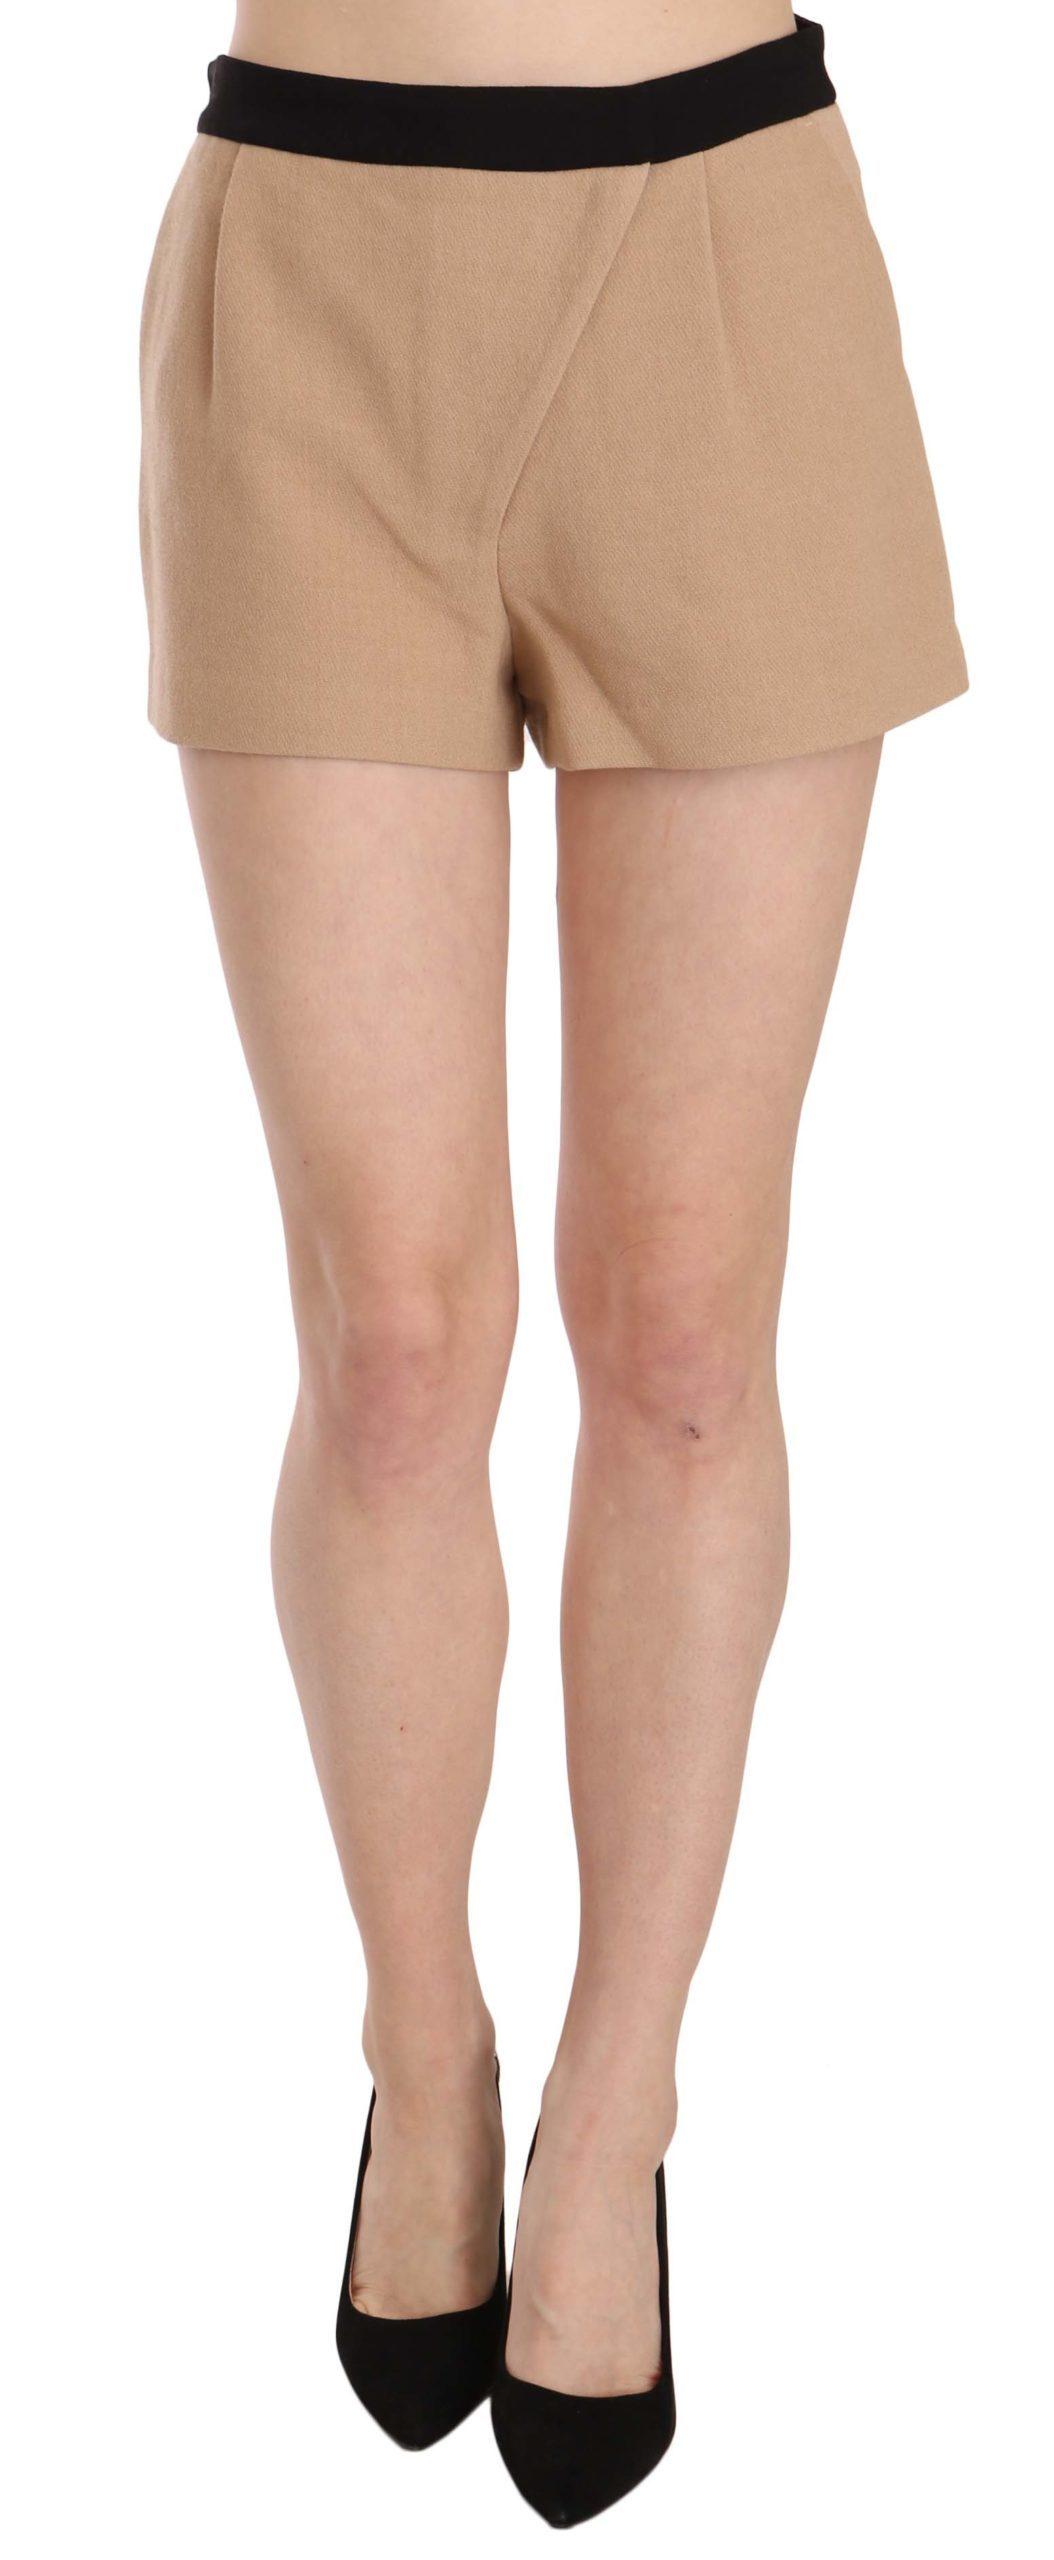 Costume National Women's Cotton Mid Waist Mini Short Beige TSH3951 - IT42|M